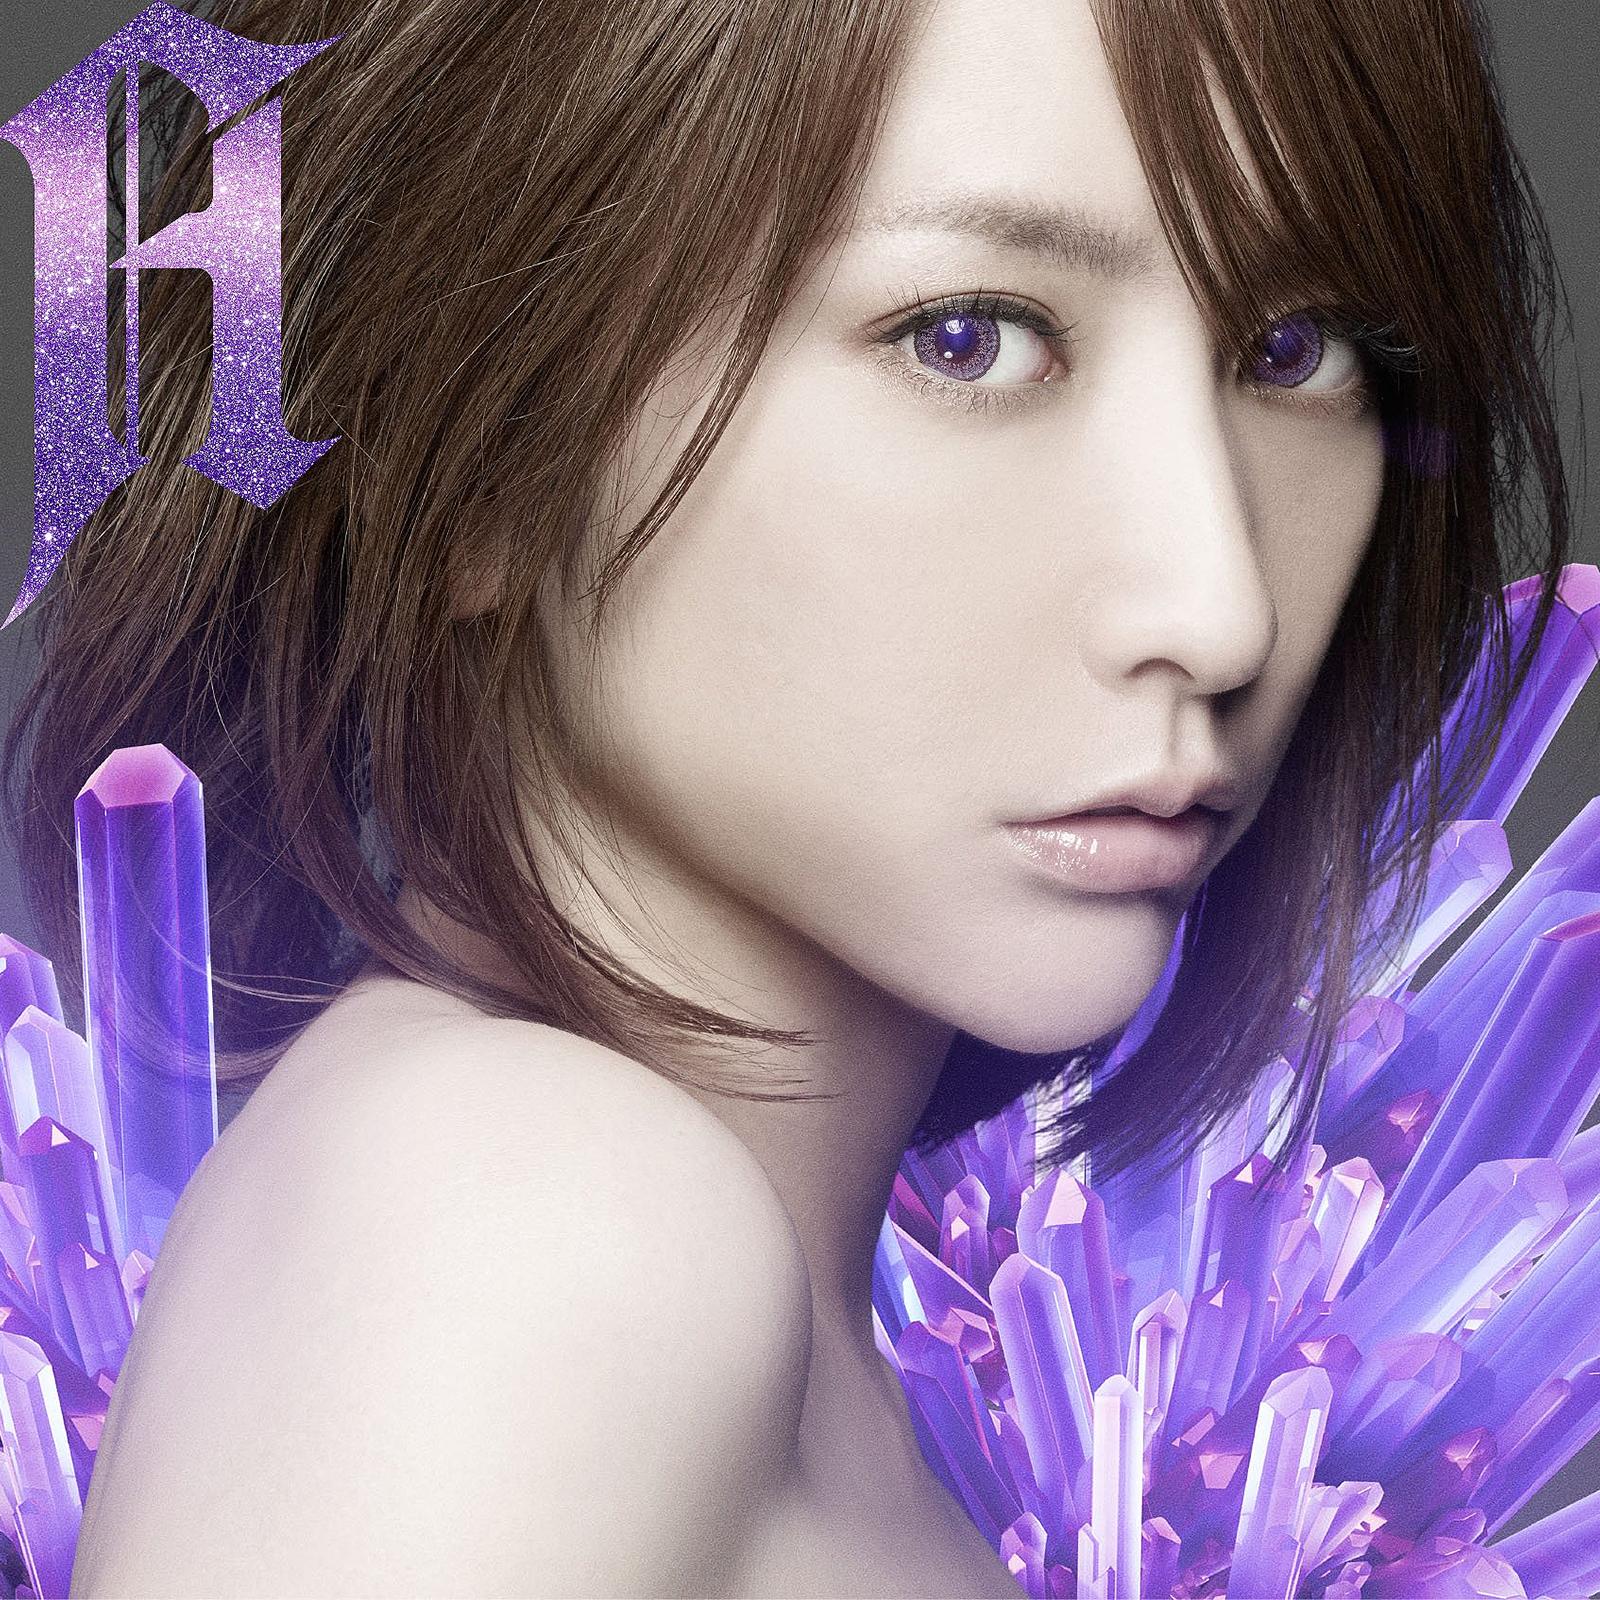 Art Work Japan: 藍井エイル - BEST